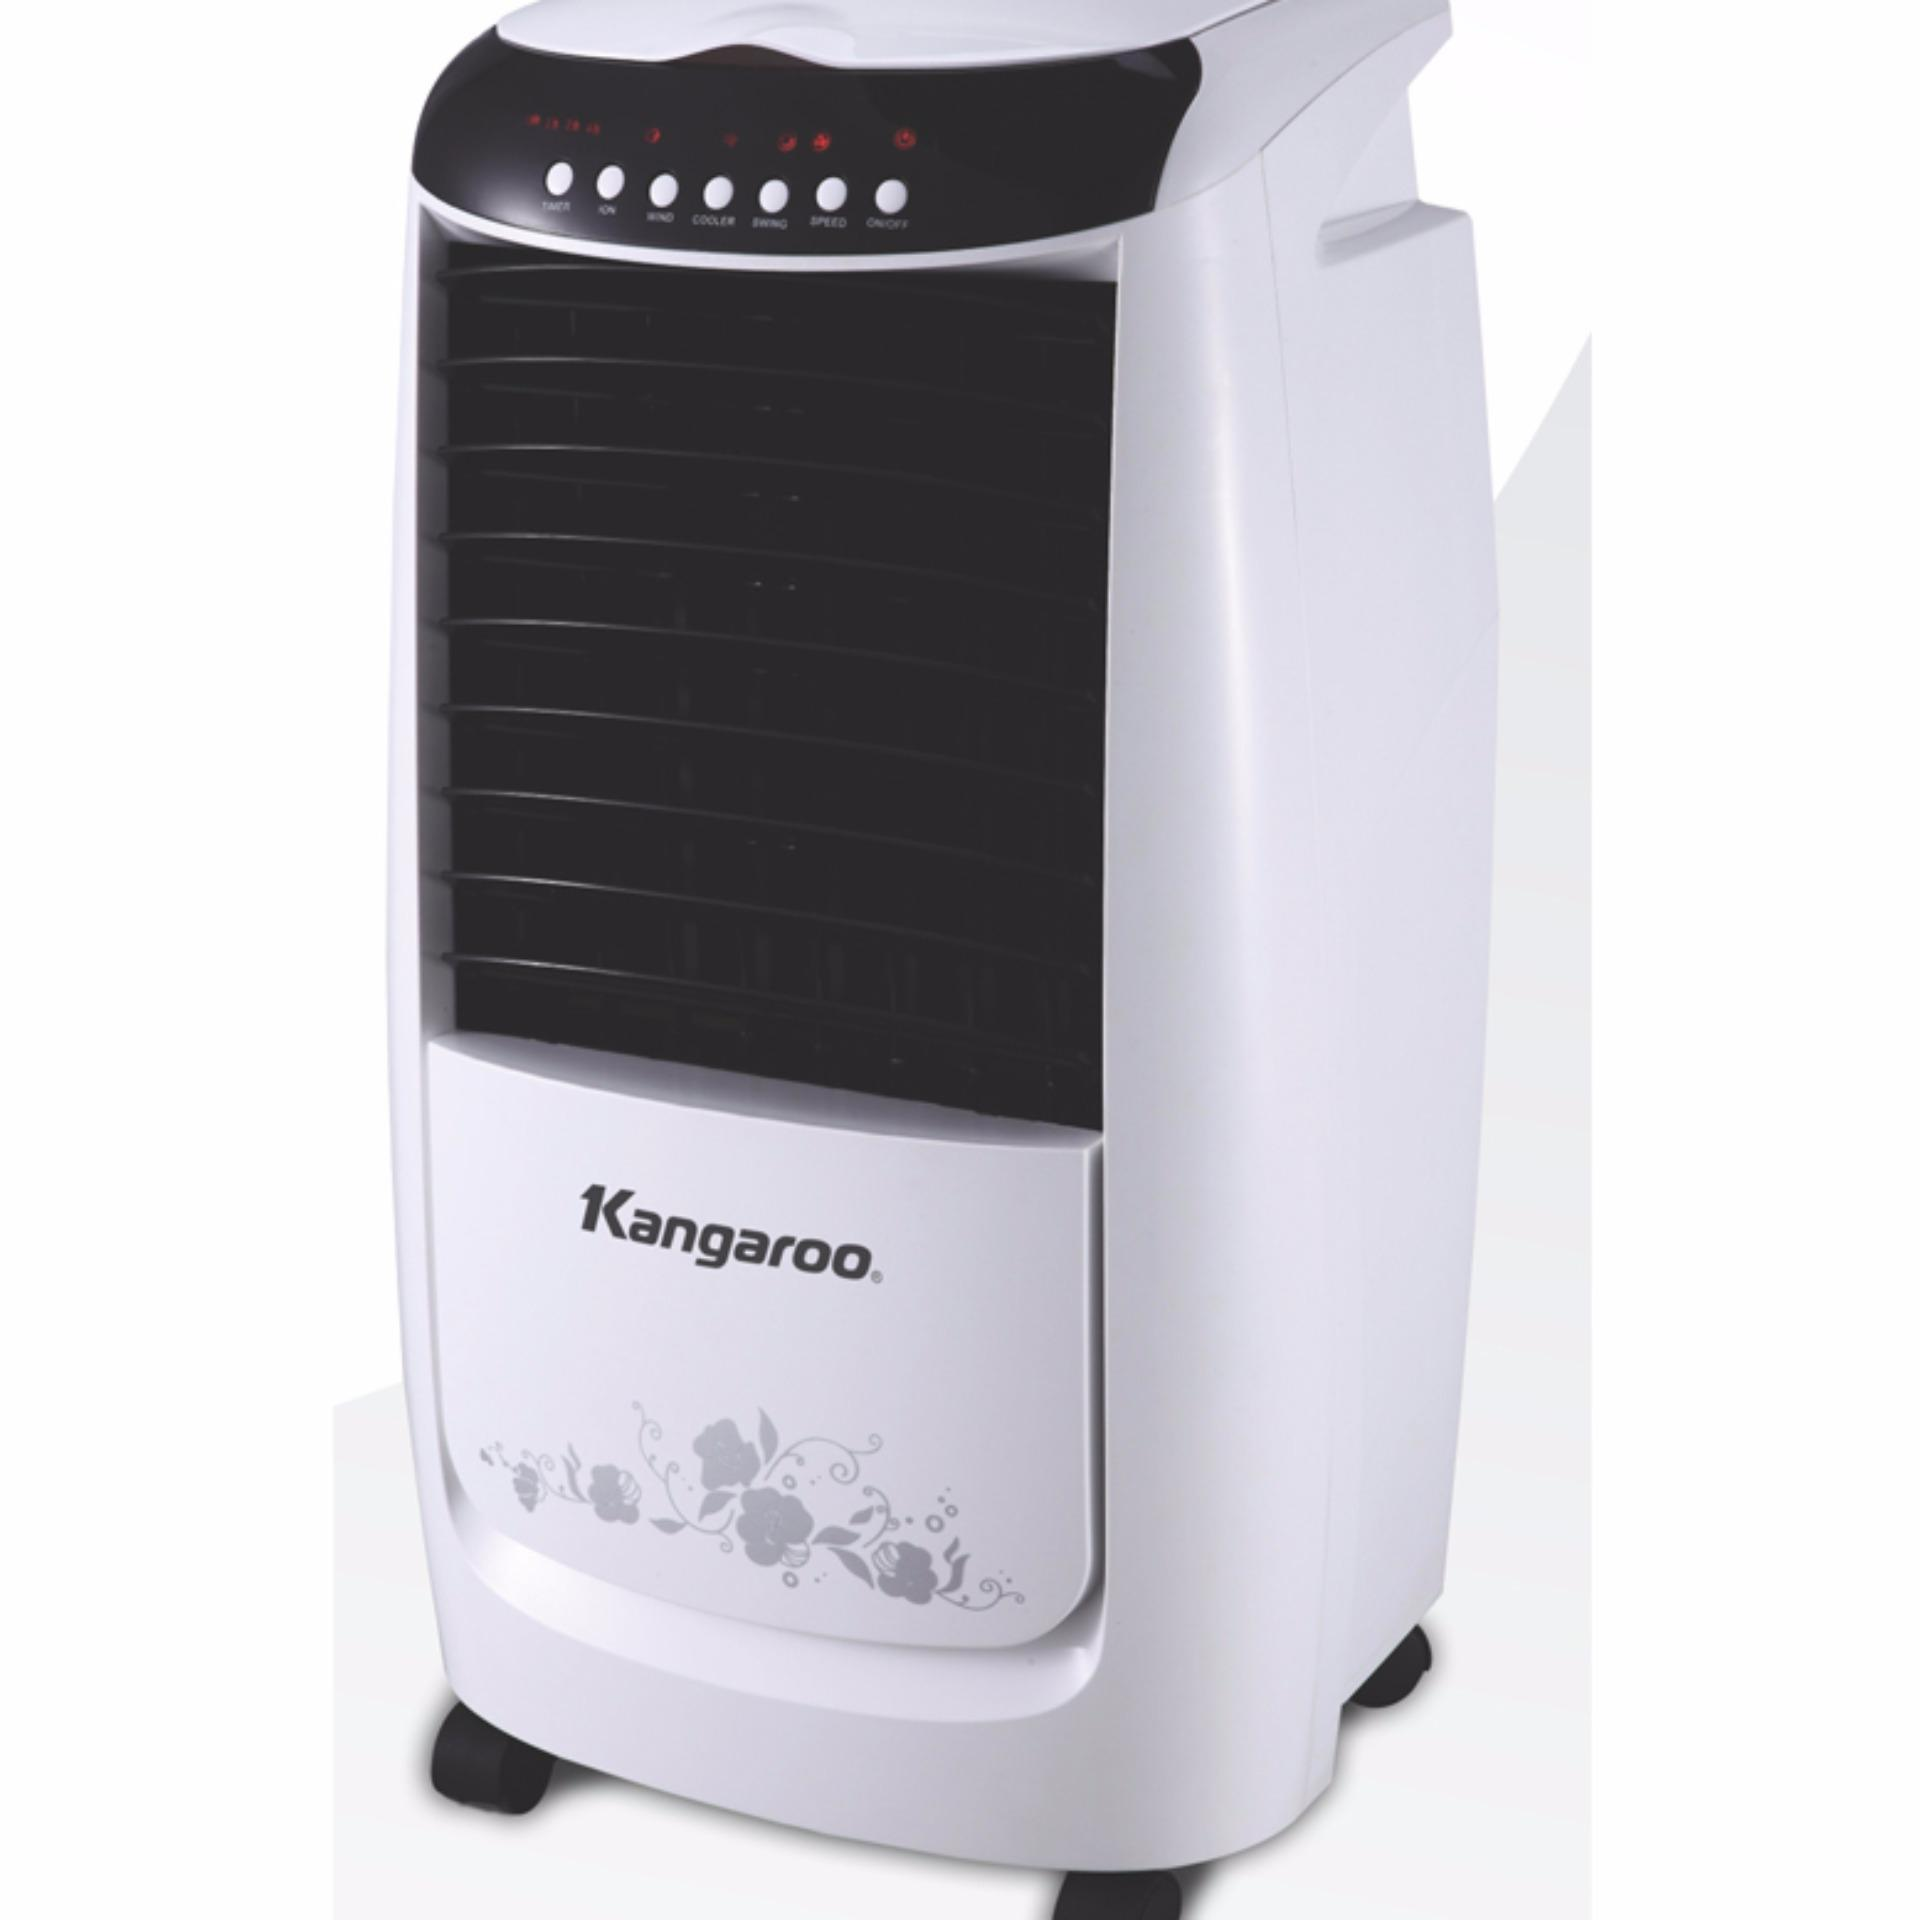 Perbandingan Harga Kangaroo Air Cooler Pendingin Ox 815n Oxone Ruangan Kg50f09